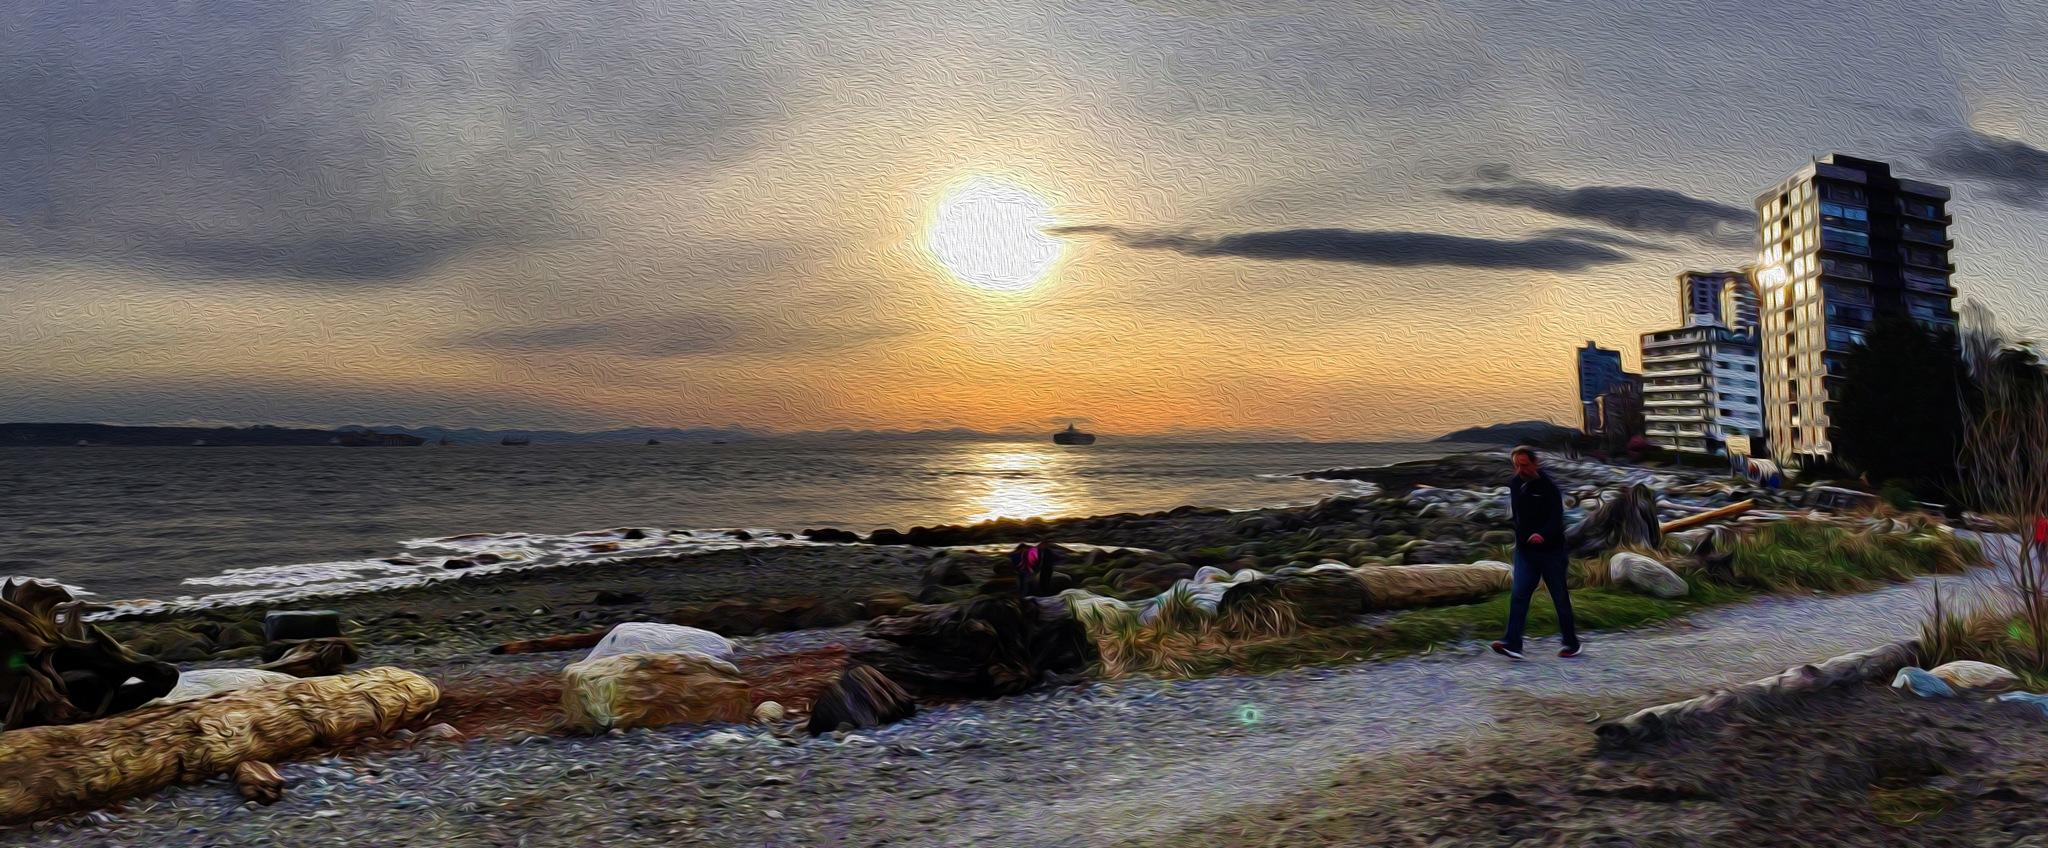 Waterfront Sunset by Donald Bruce Edward Wilson